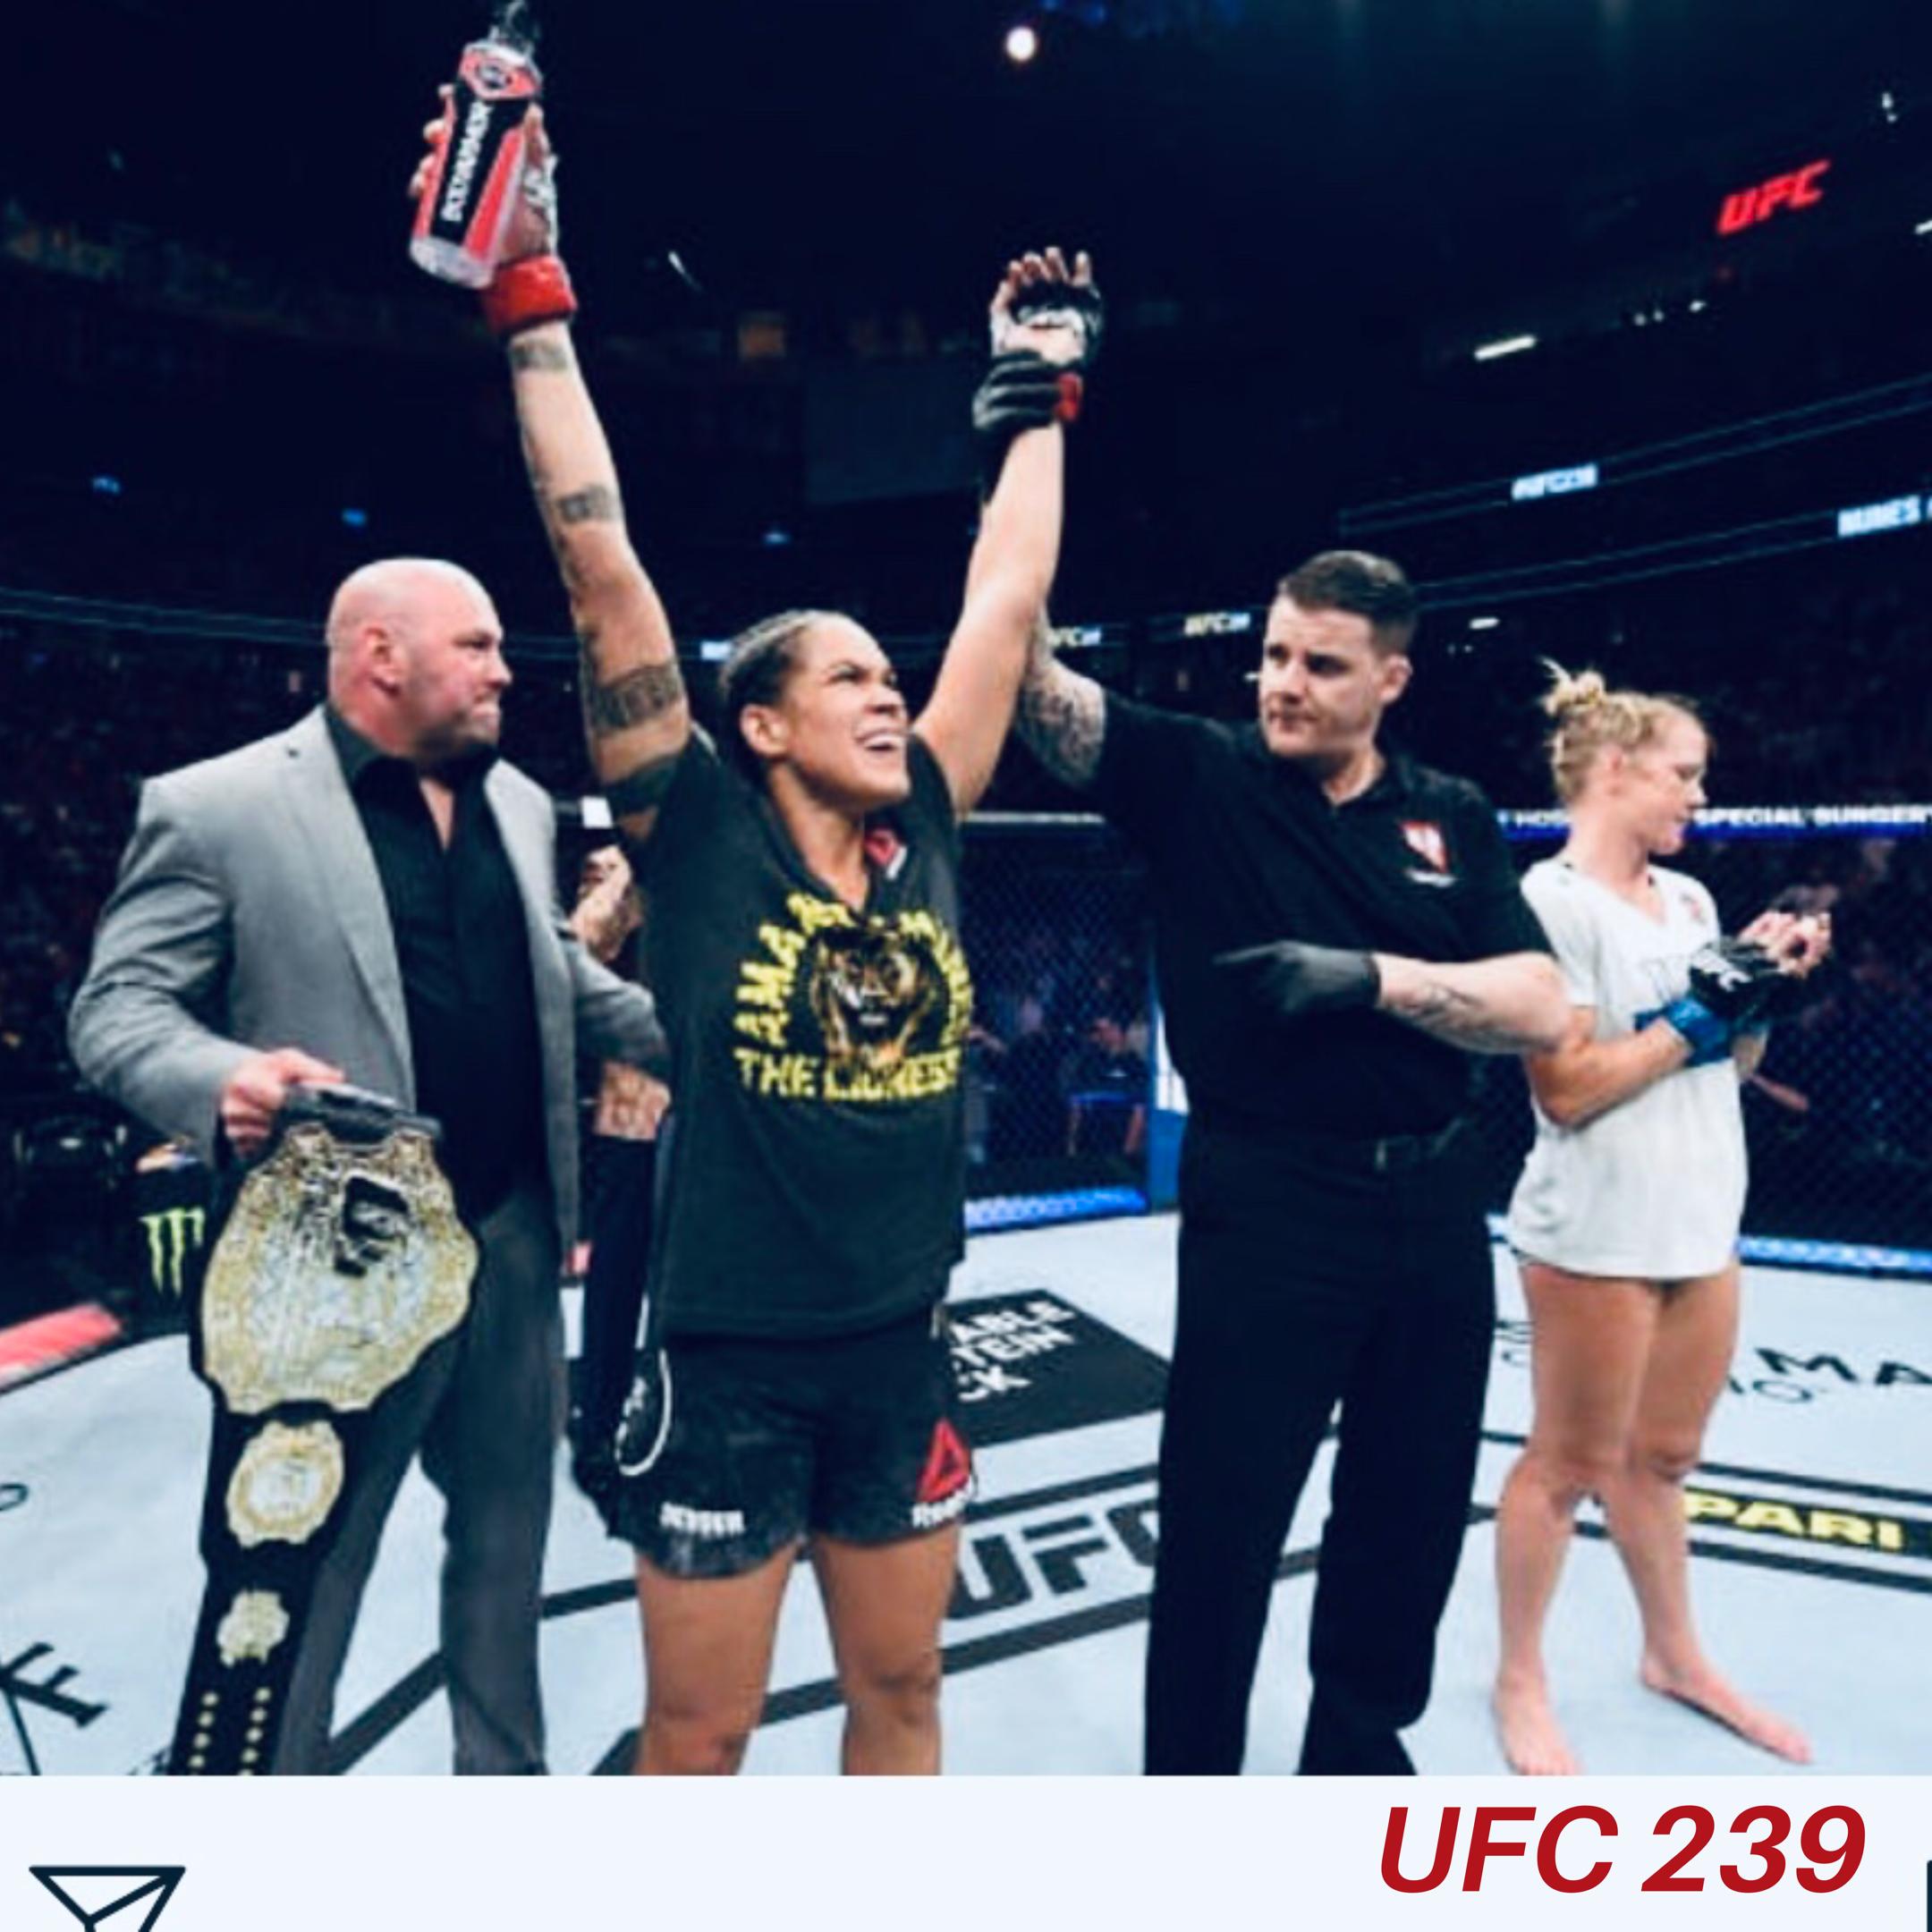 Amanda Nunes Knocks Out Holly Holm in UFC 239 | Sports, NBA